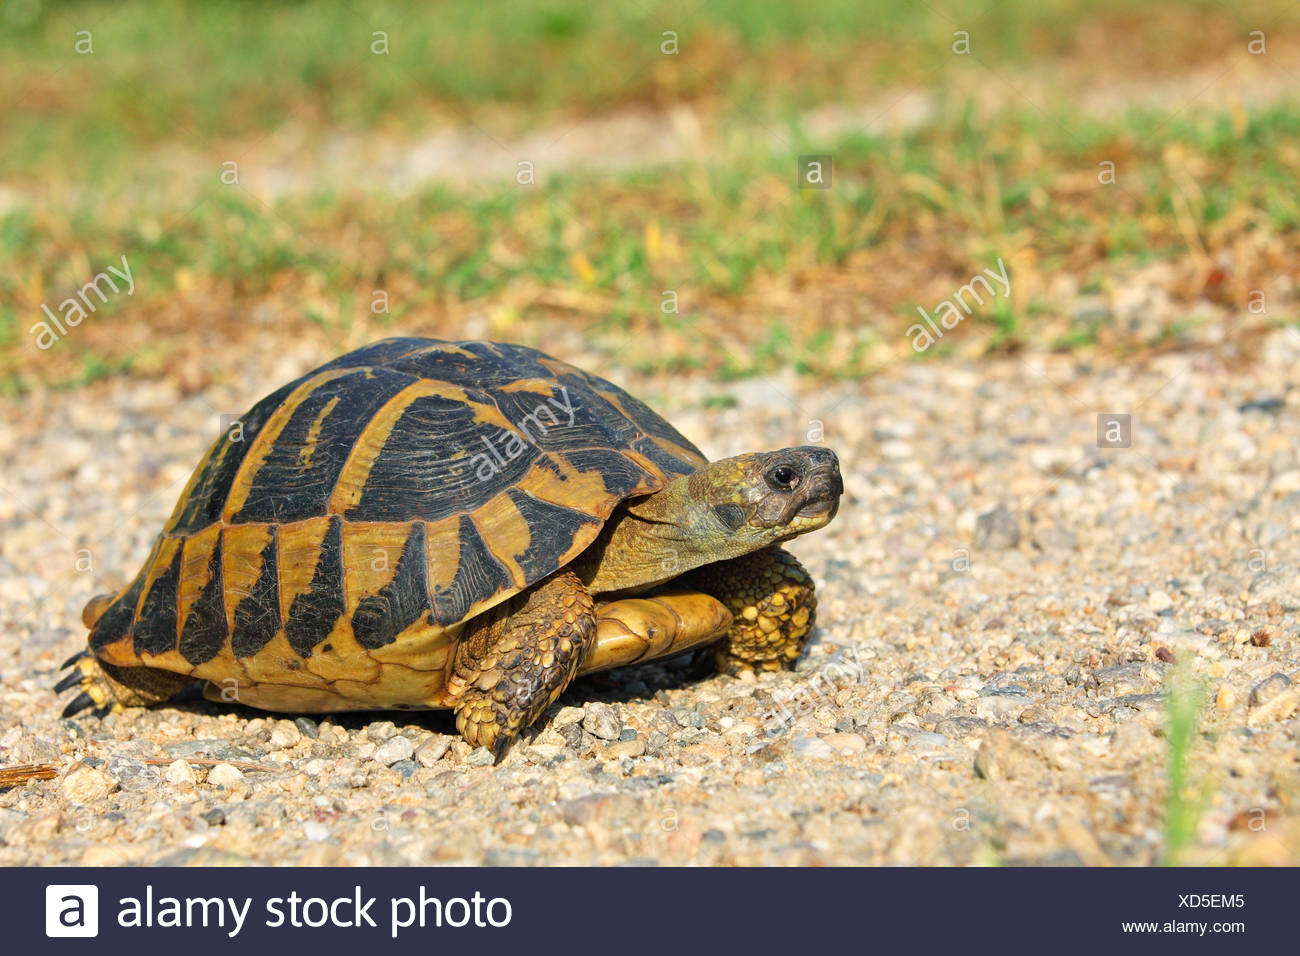 Hermann's tortoise, Greek tortoise (Testudo hermanni), walking tortoise, Greece, Lake Kerkini - Stock Image